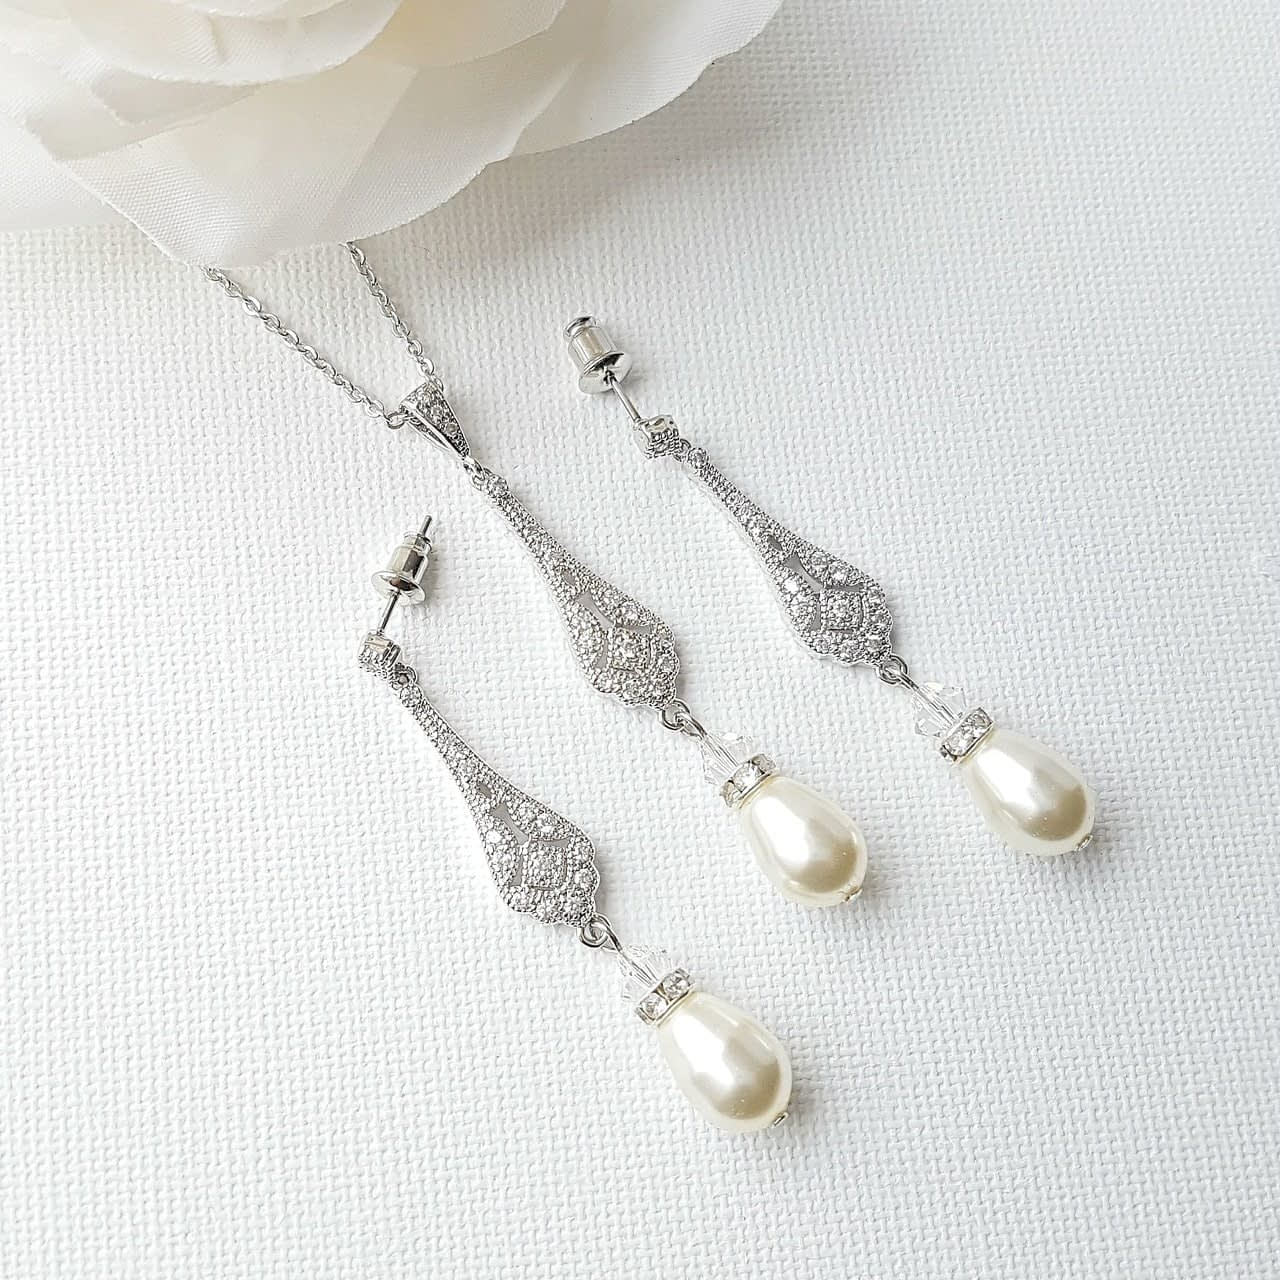 Vintage Drop Pearl Necklace Earring Set